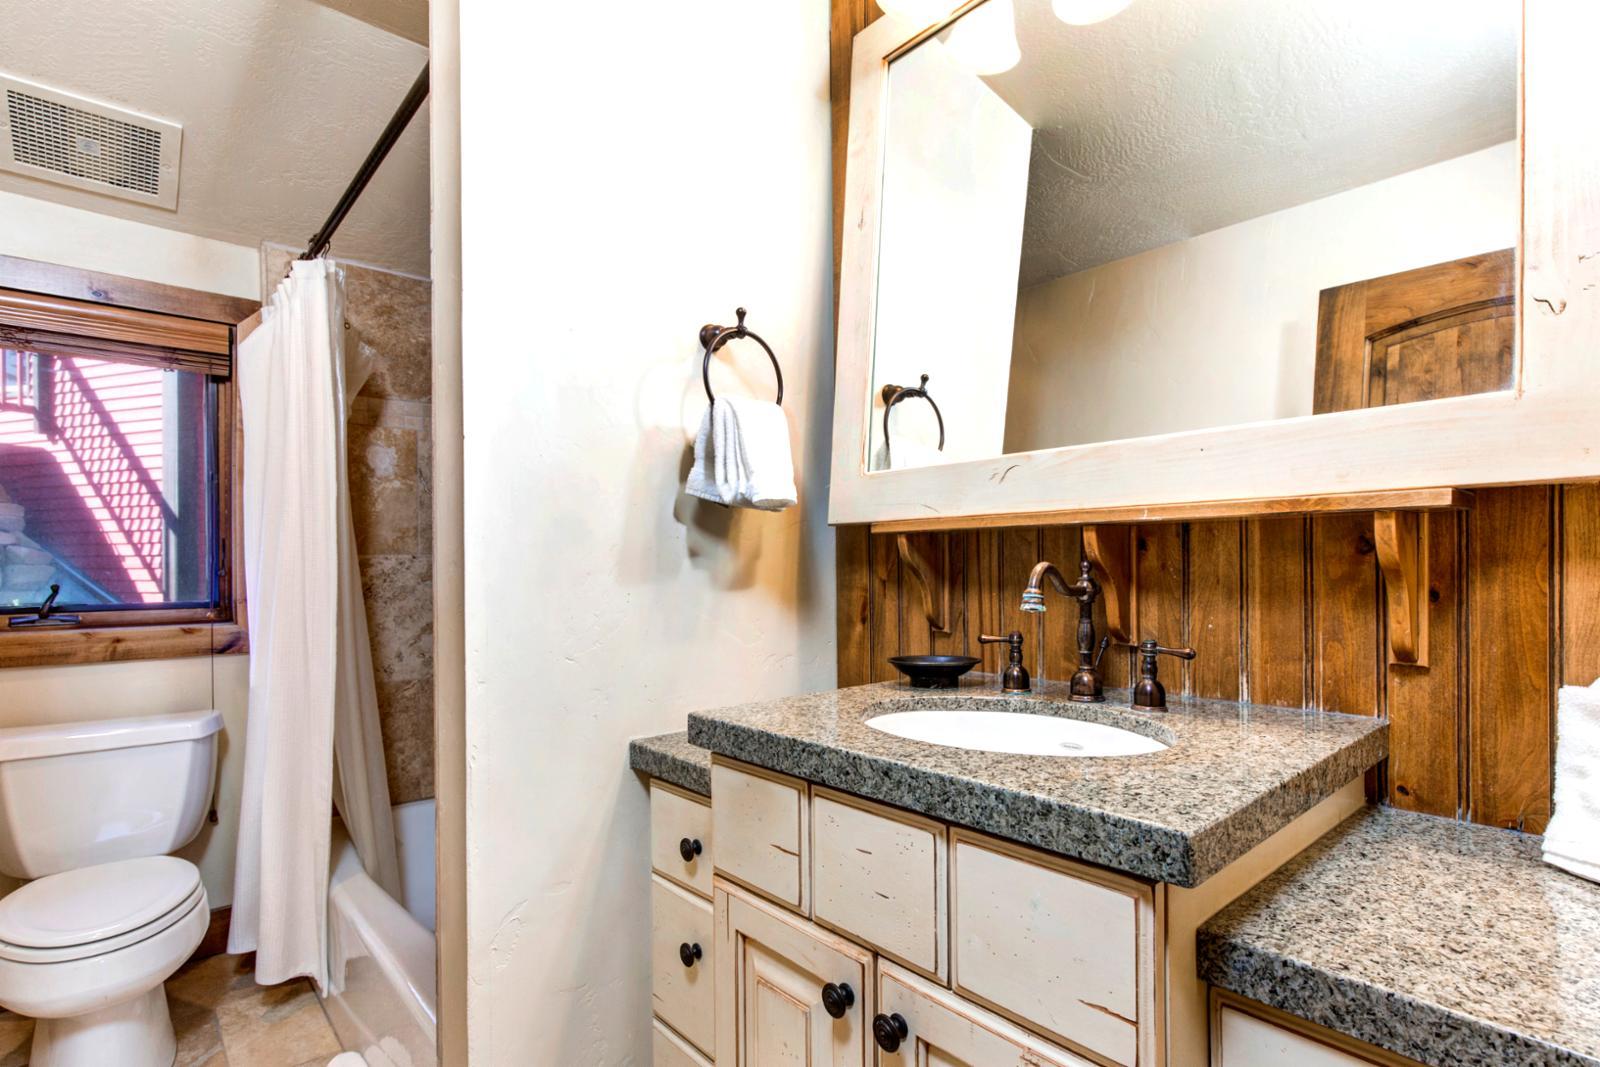 Shared bathroom with plenty of room